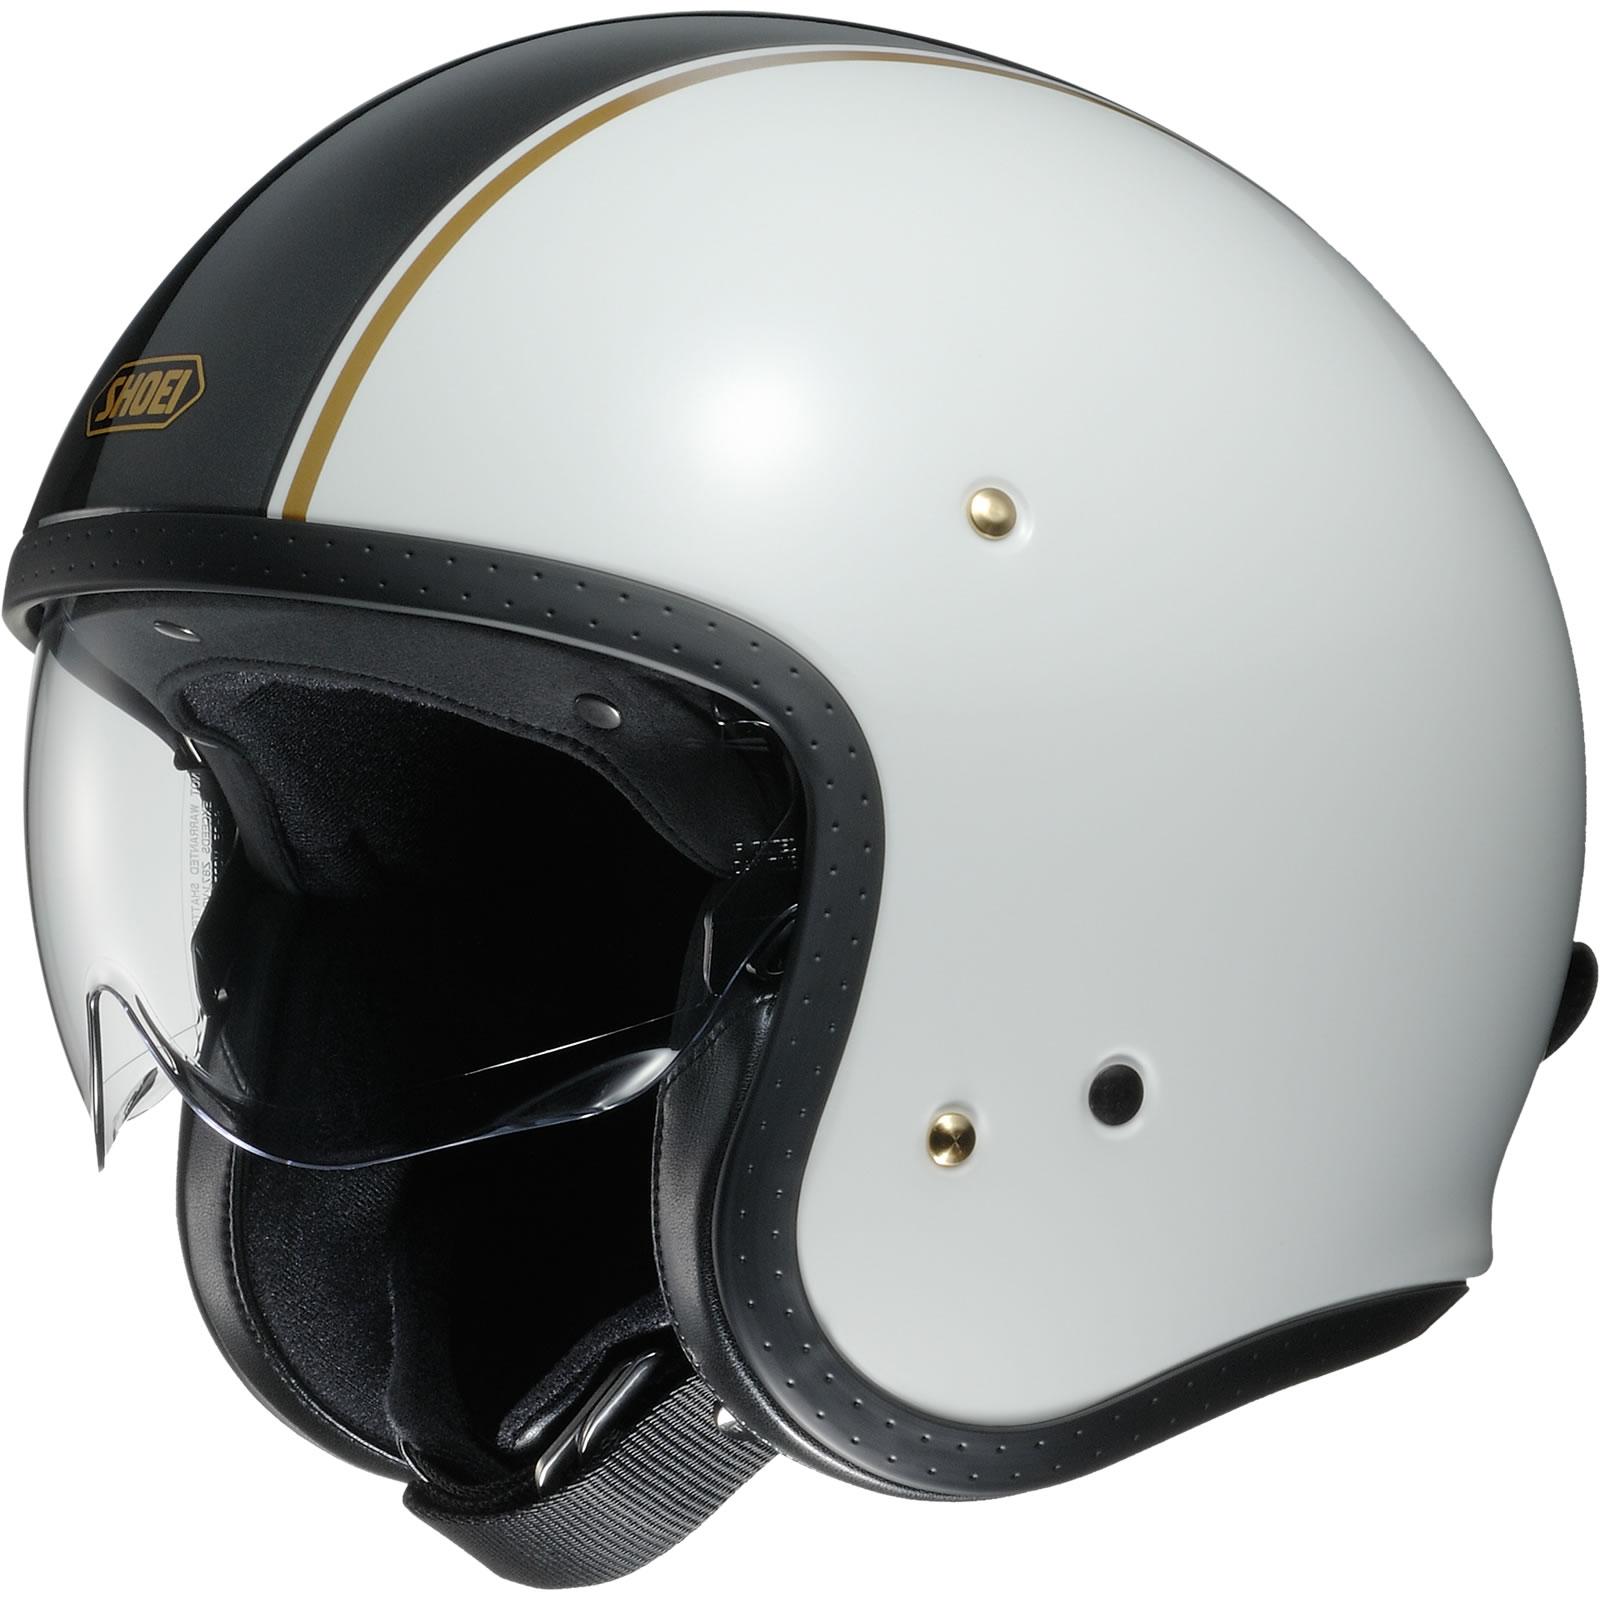 Shoei-J-O-Carburettor-Open-Face-Motorcycle-Helmet-amp-Visor-Retro-Motorbike-Jet